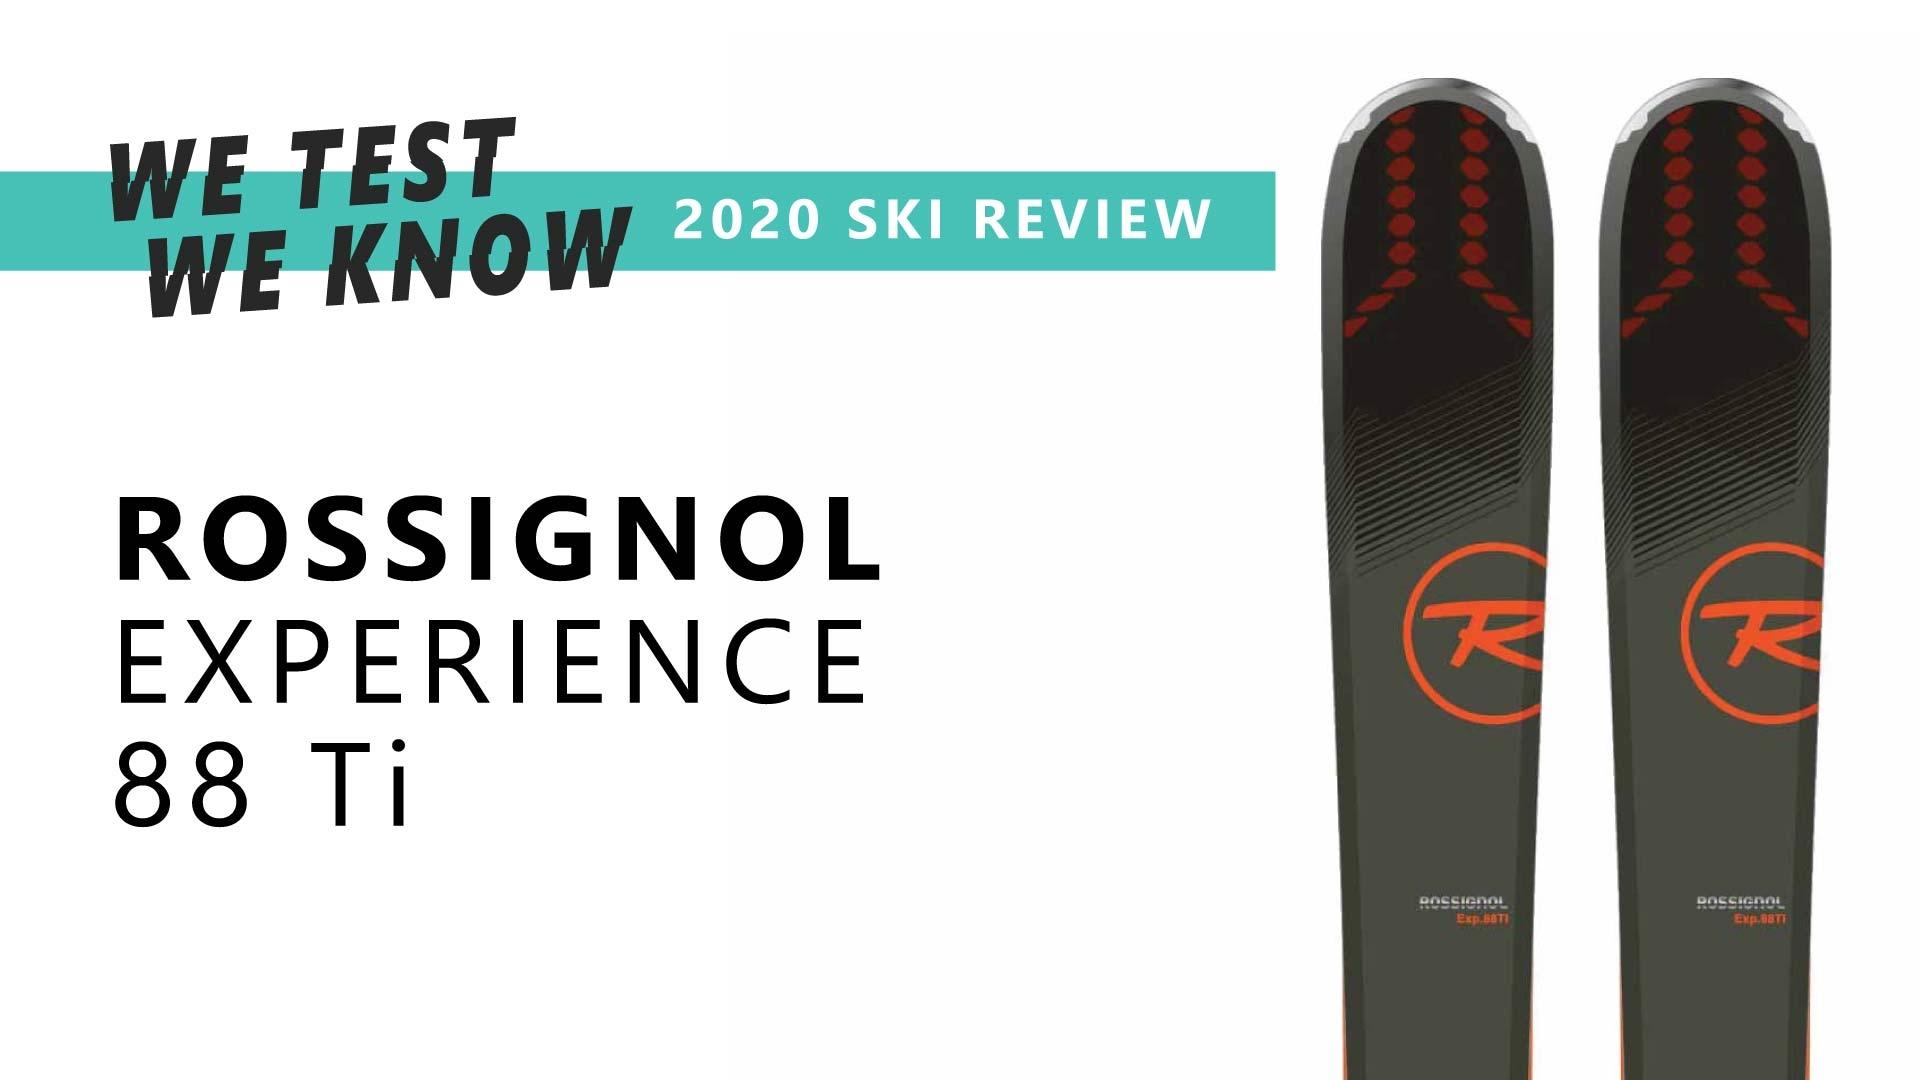 Rossignol Experience 88Ti - 2020 Ski Review